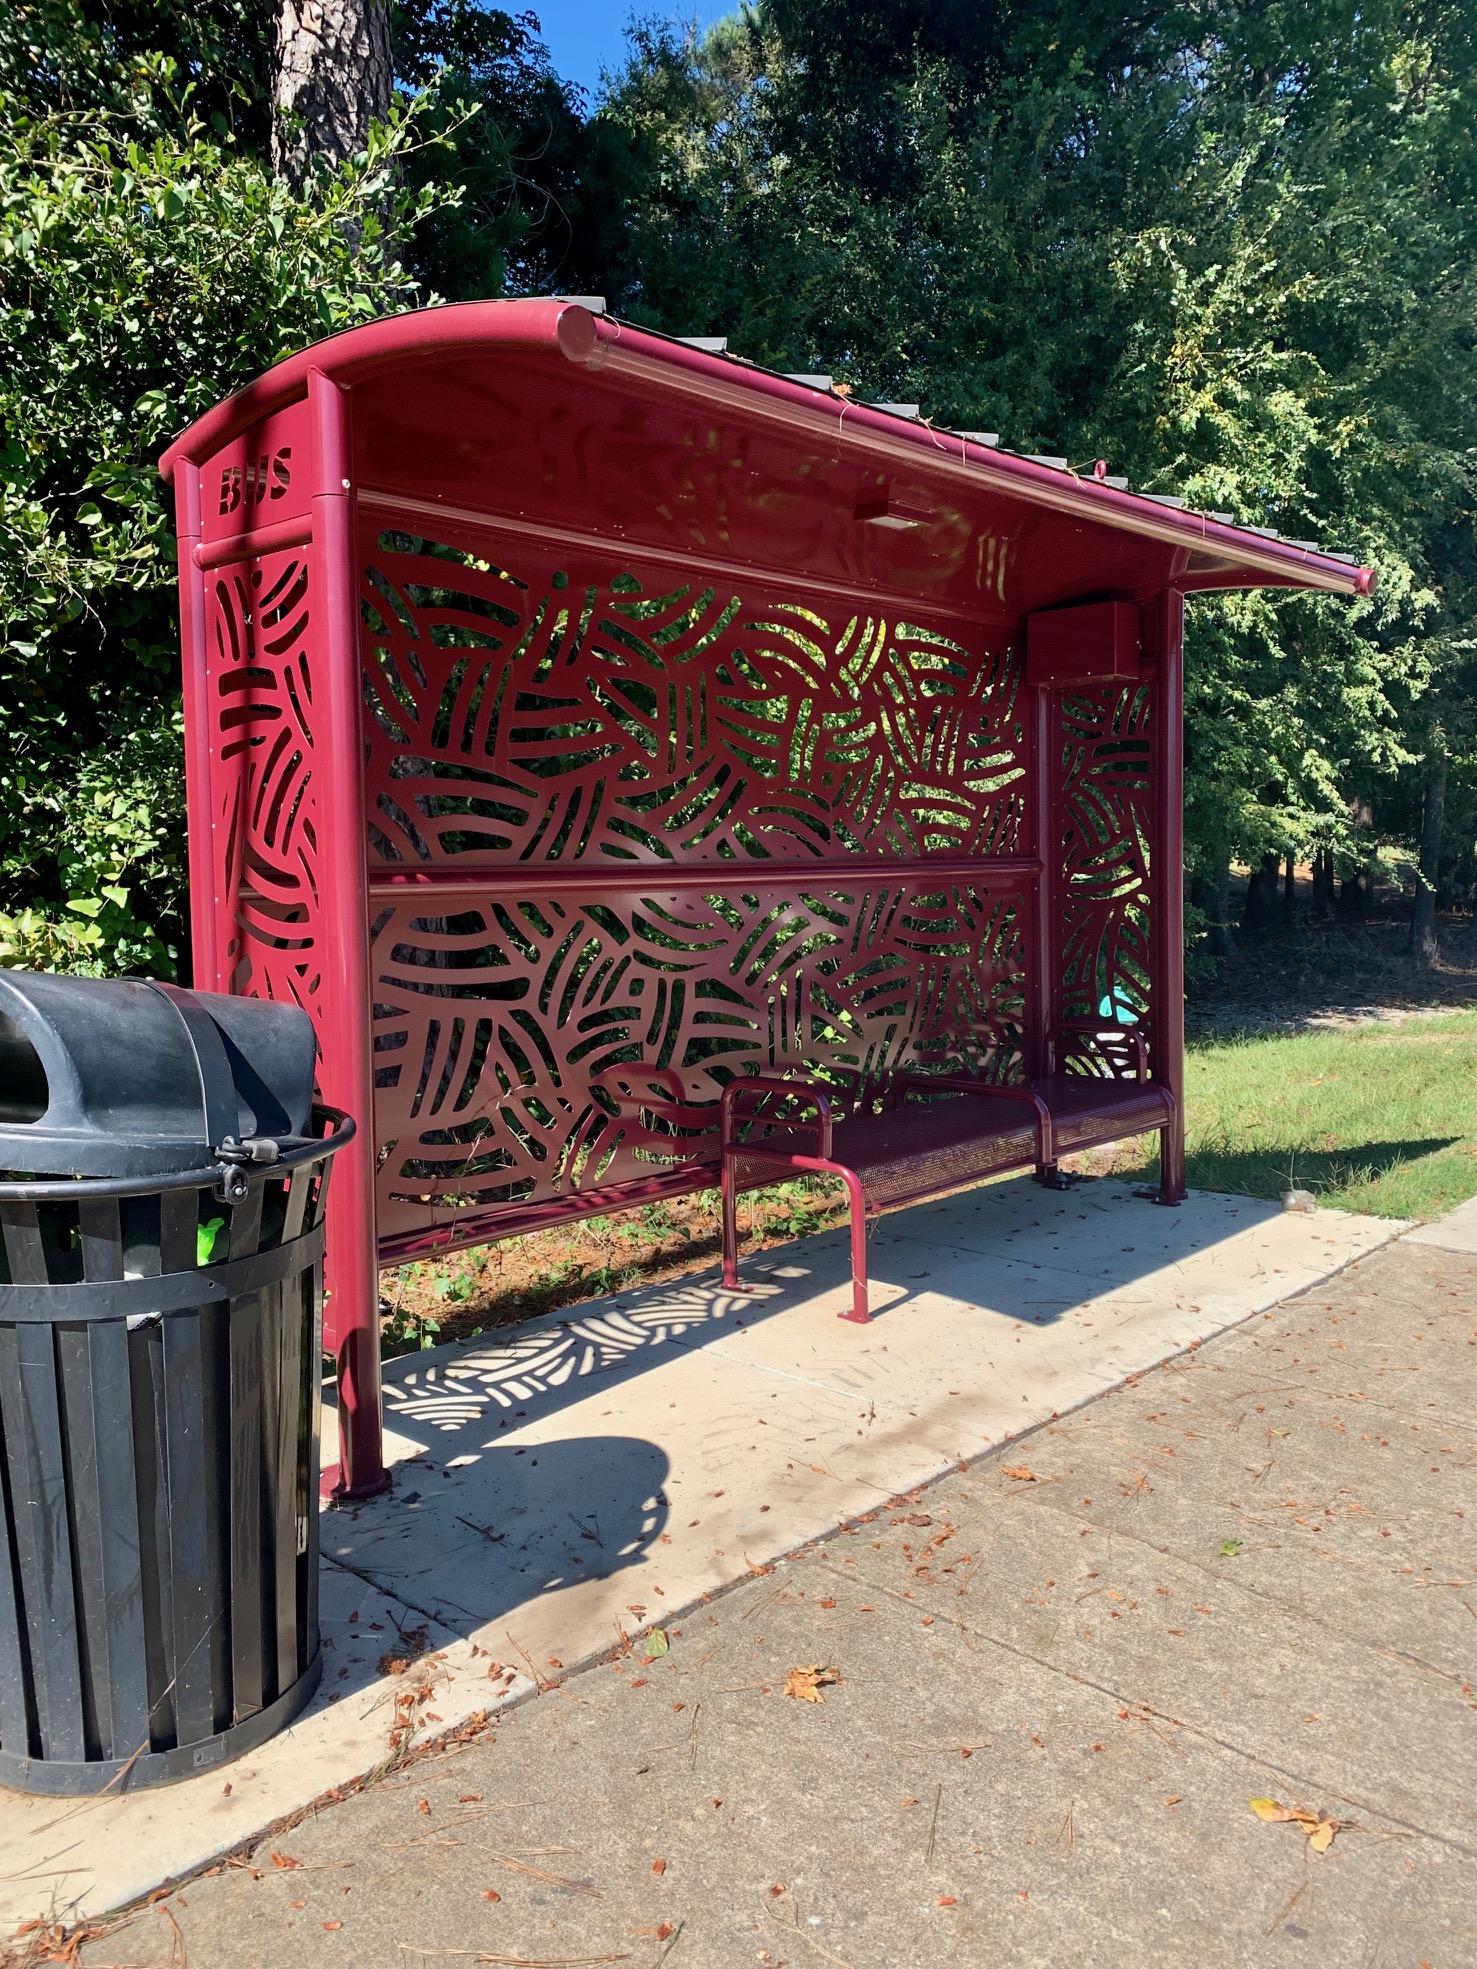 Bus Shelter Type II, Athens-Clarke , Georgia